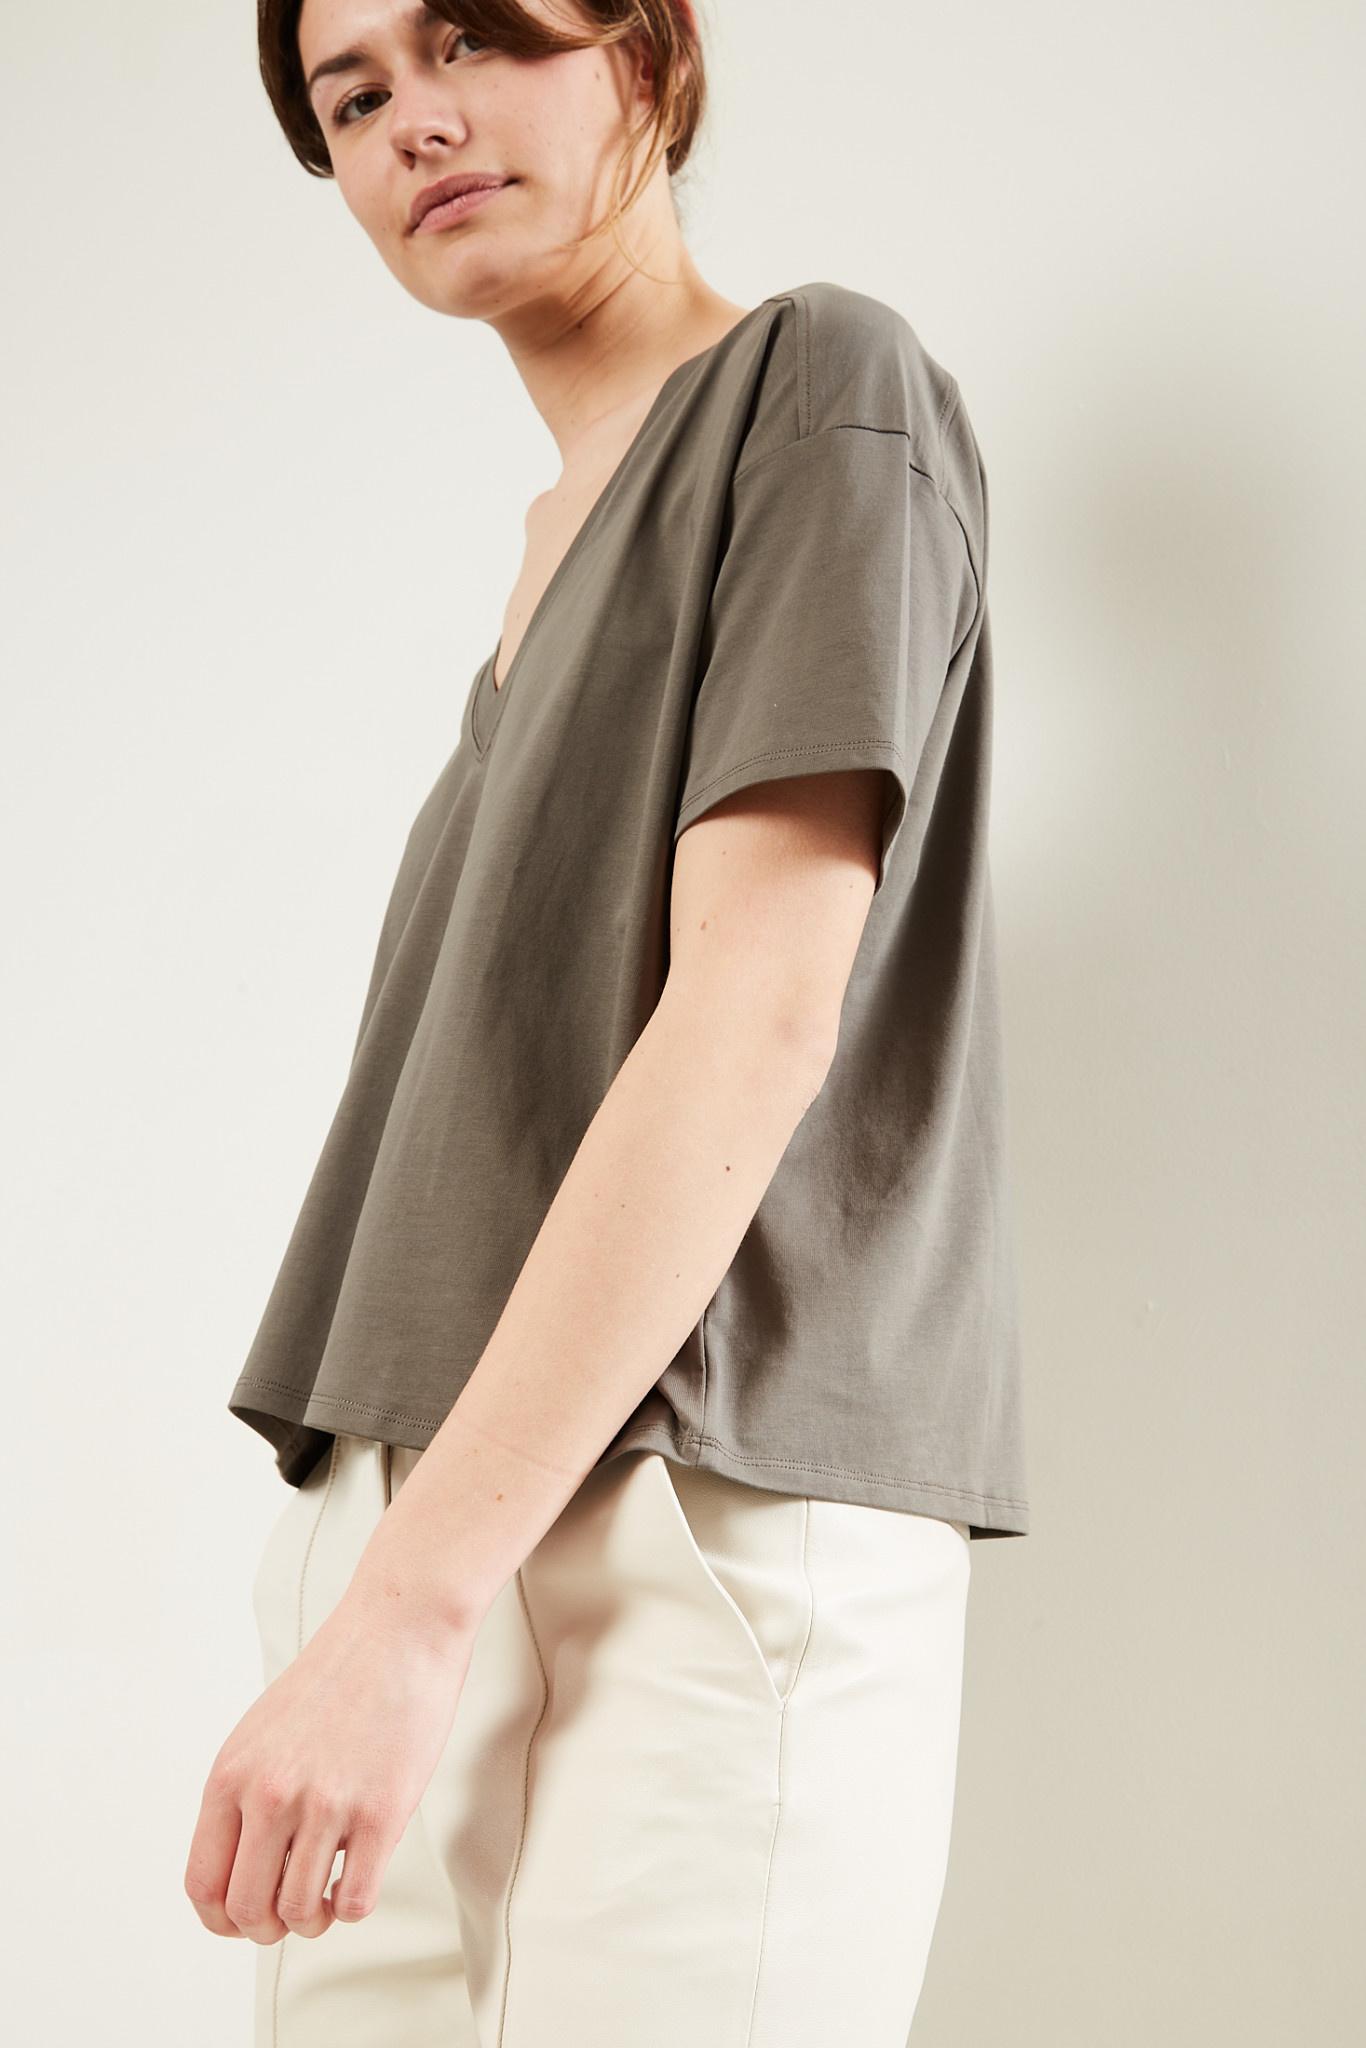 loulou studio - Faaa tshirt col v